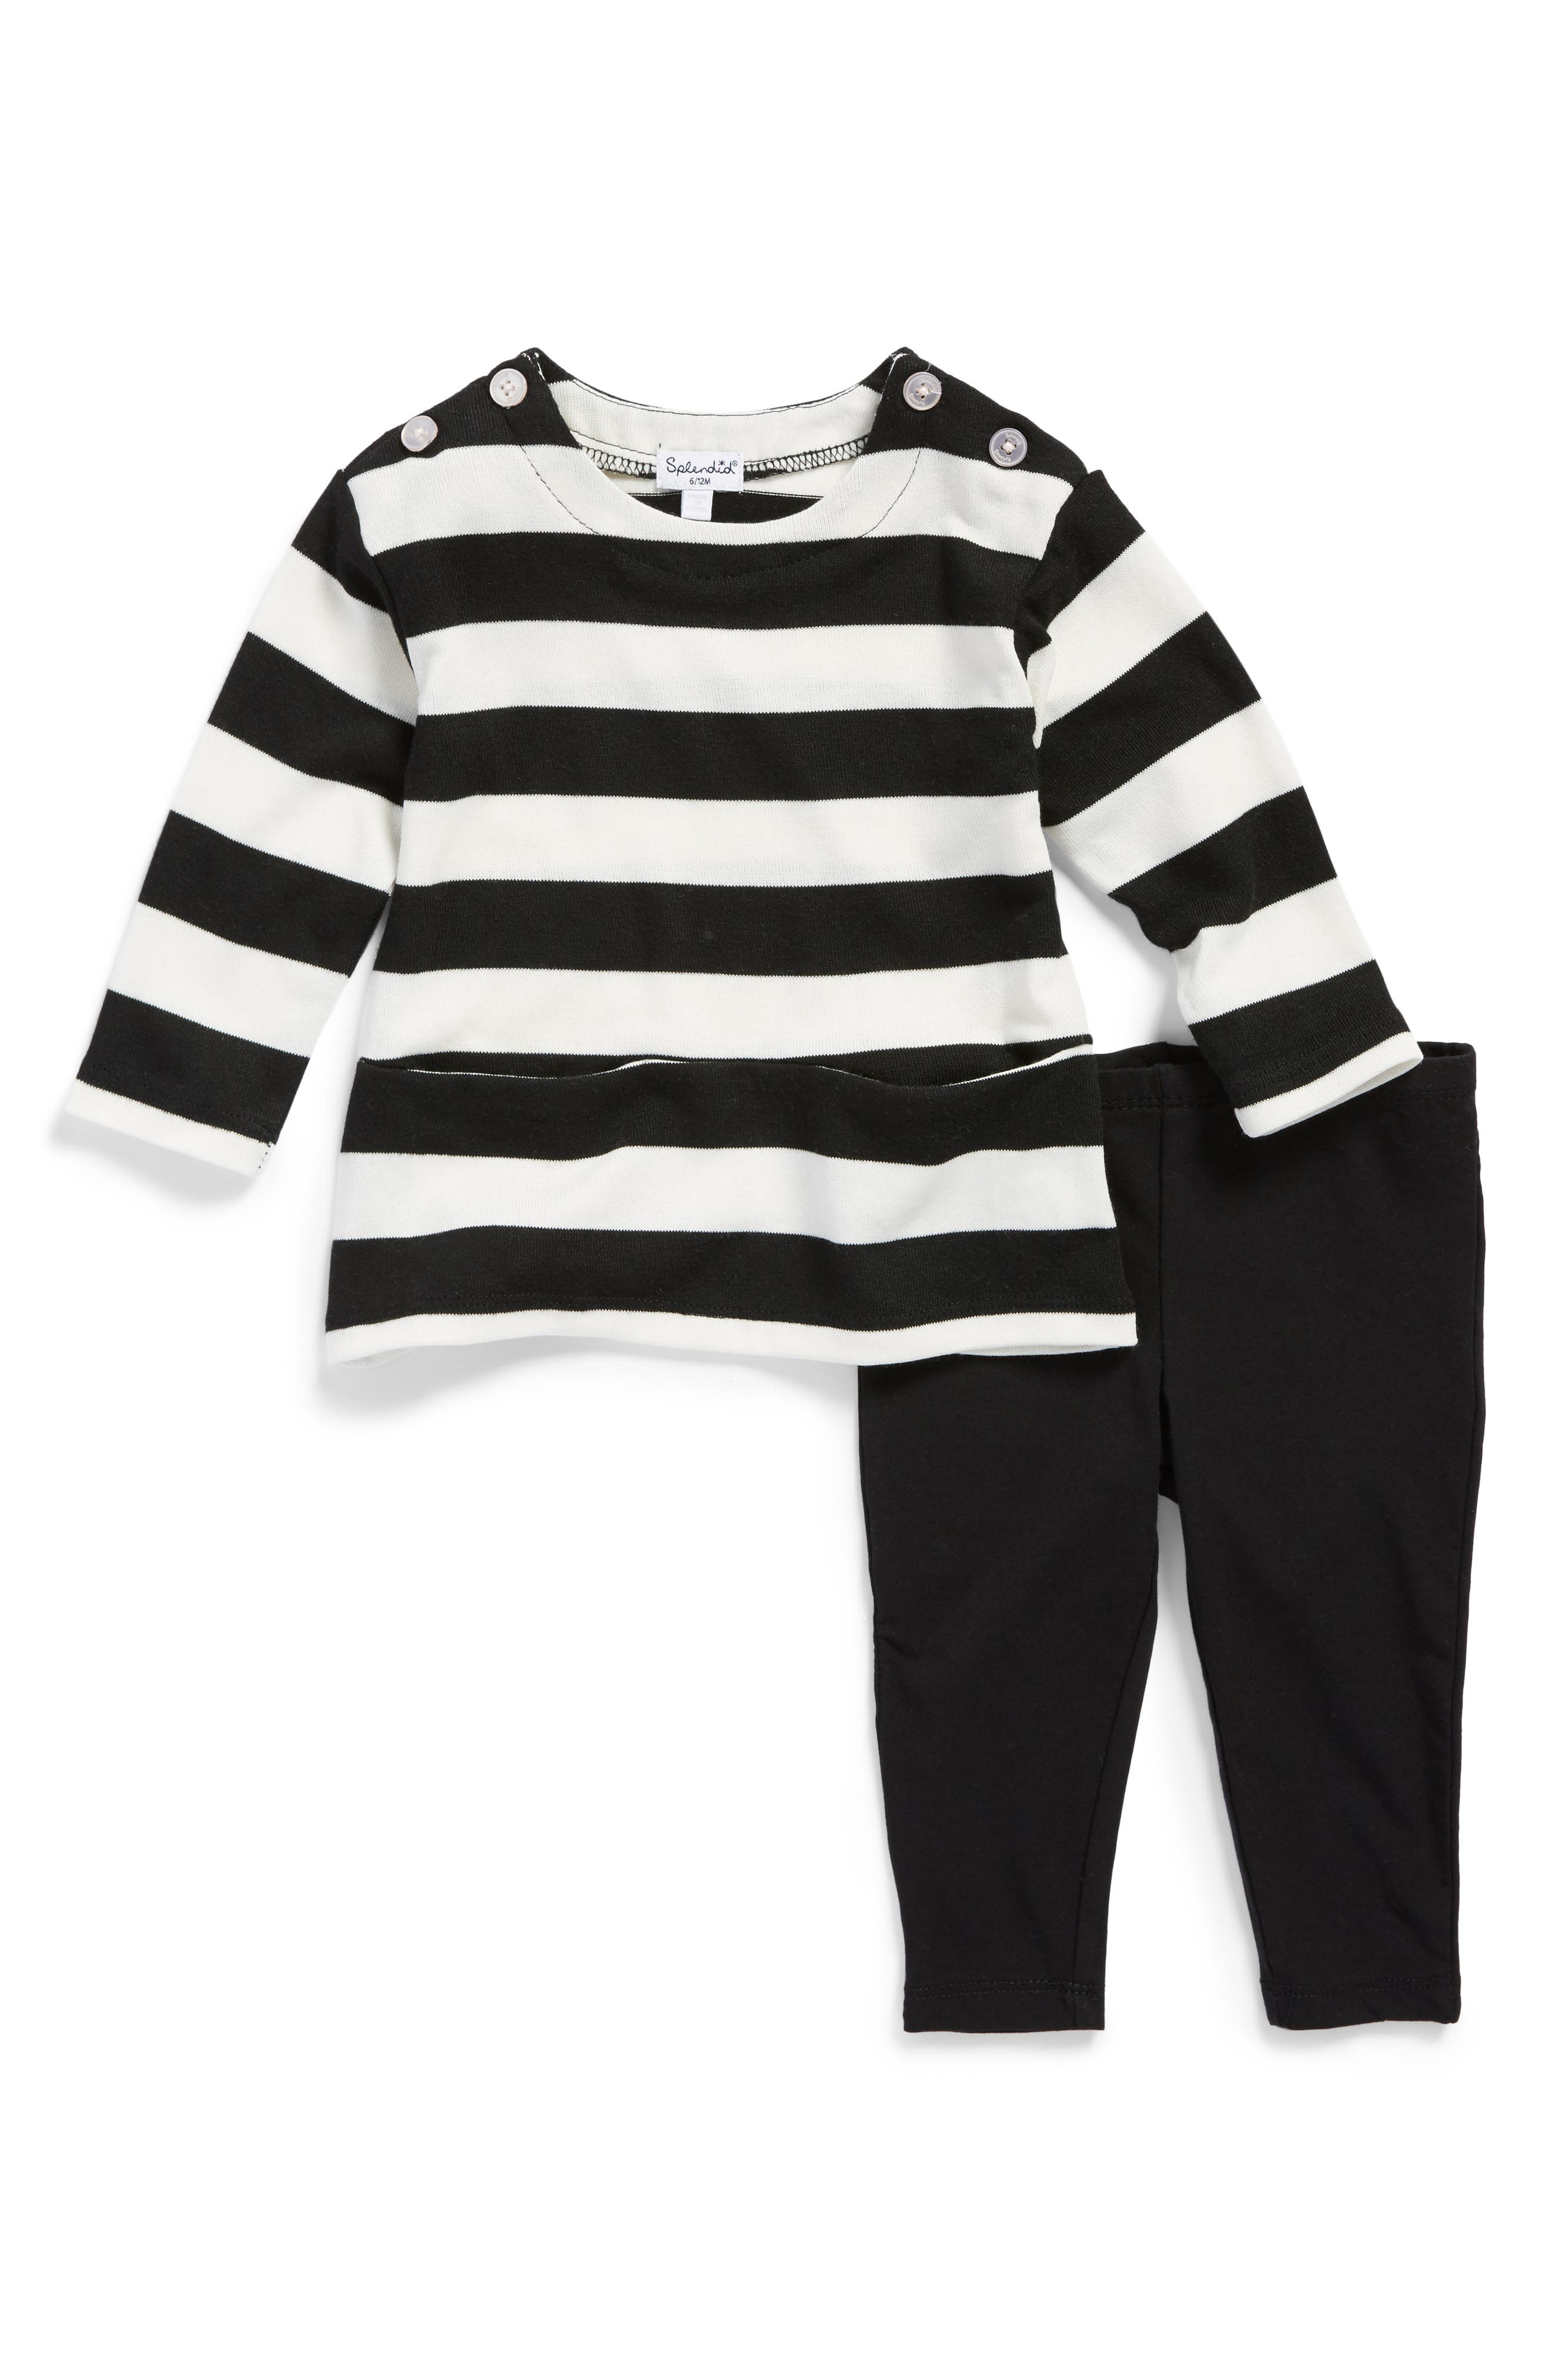 Main Image - Splendid Stripe Top & Leggings Set (Baby Girls)